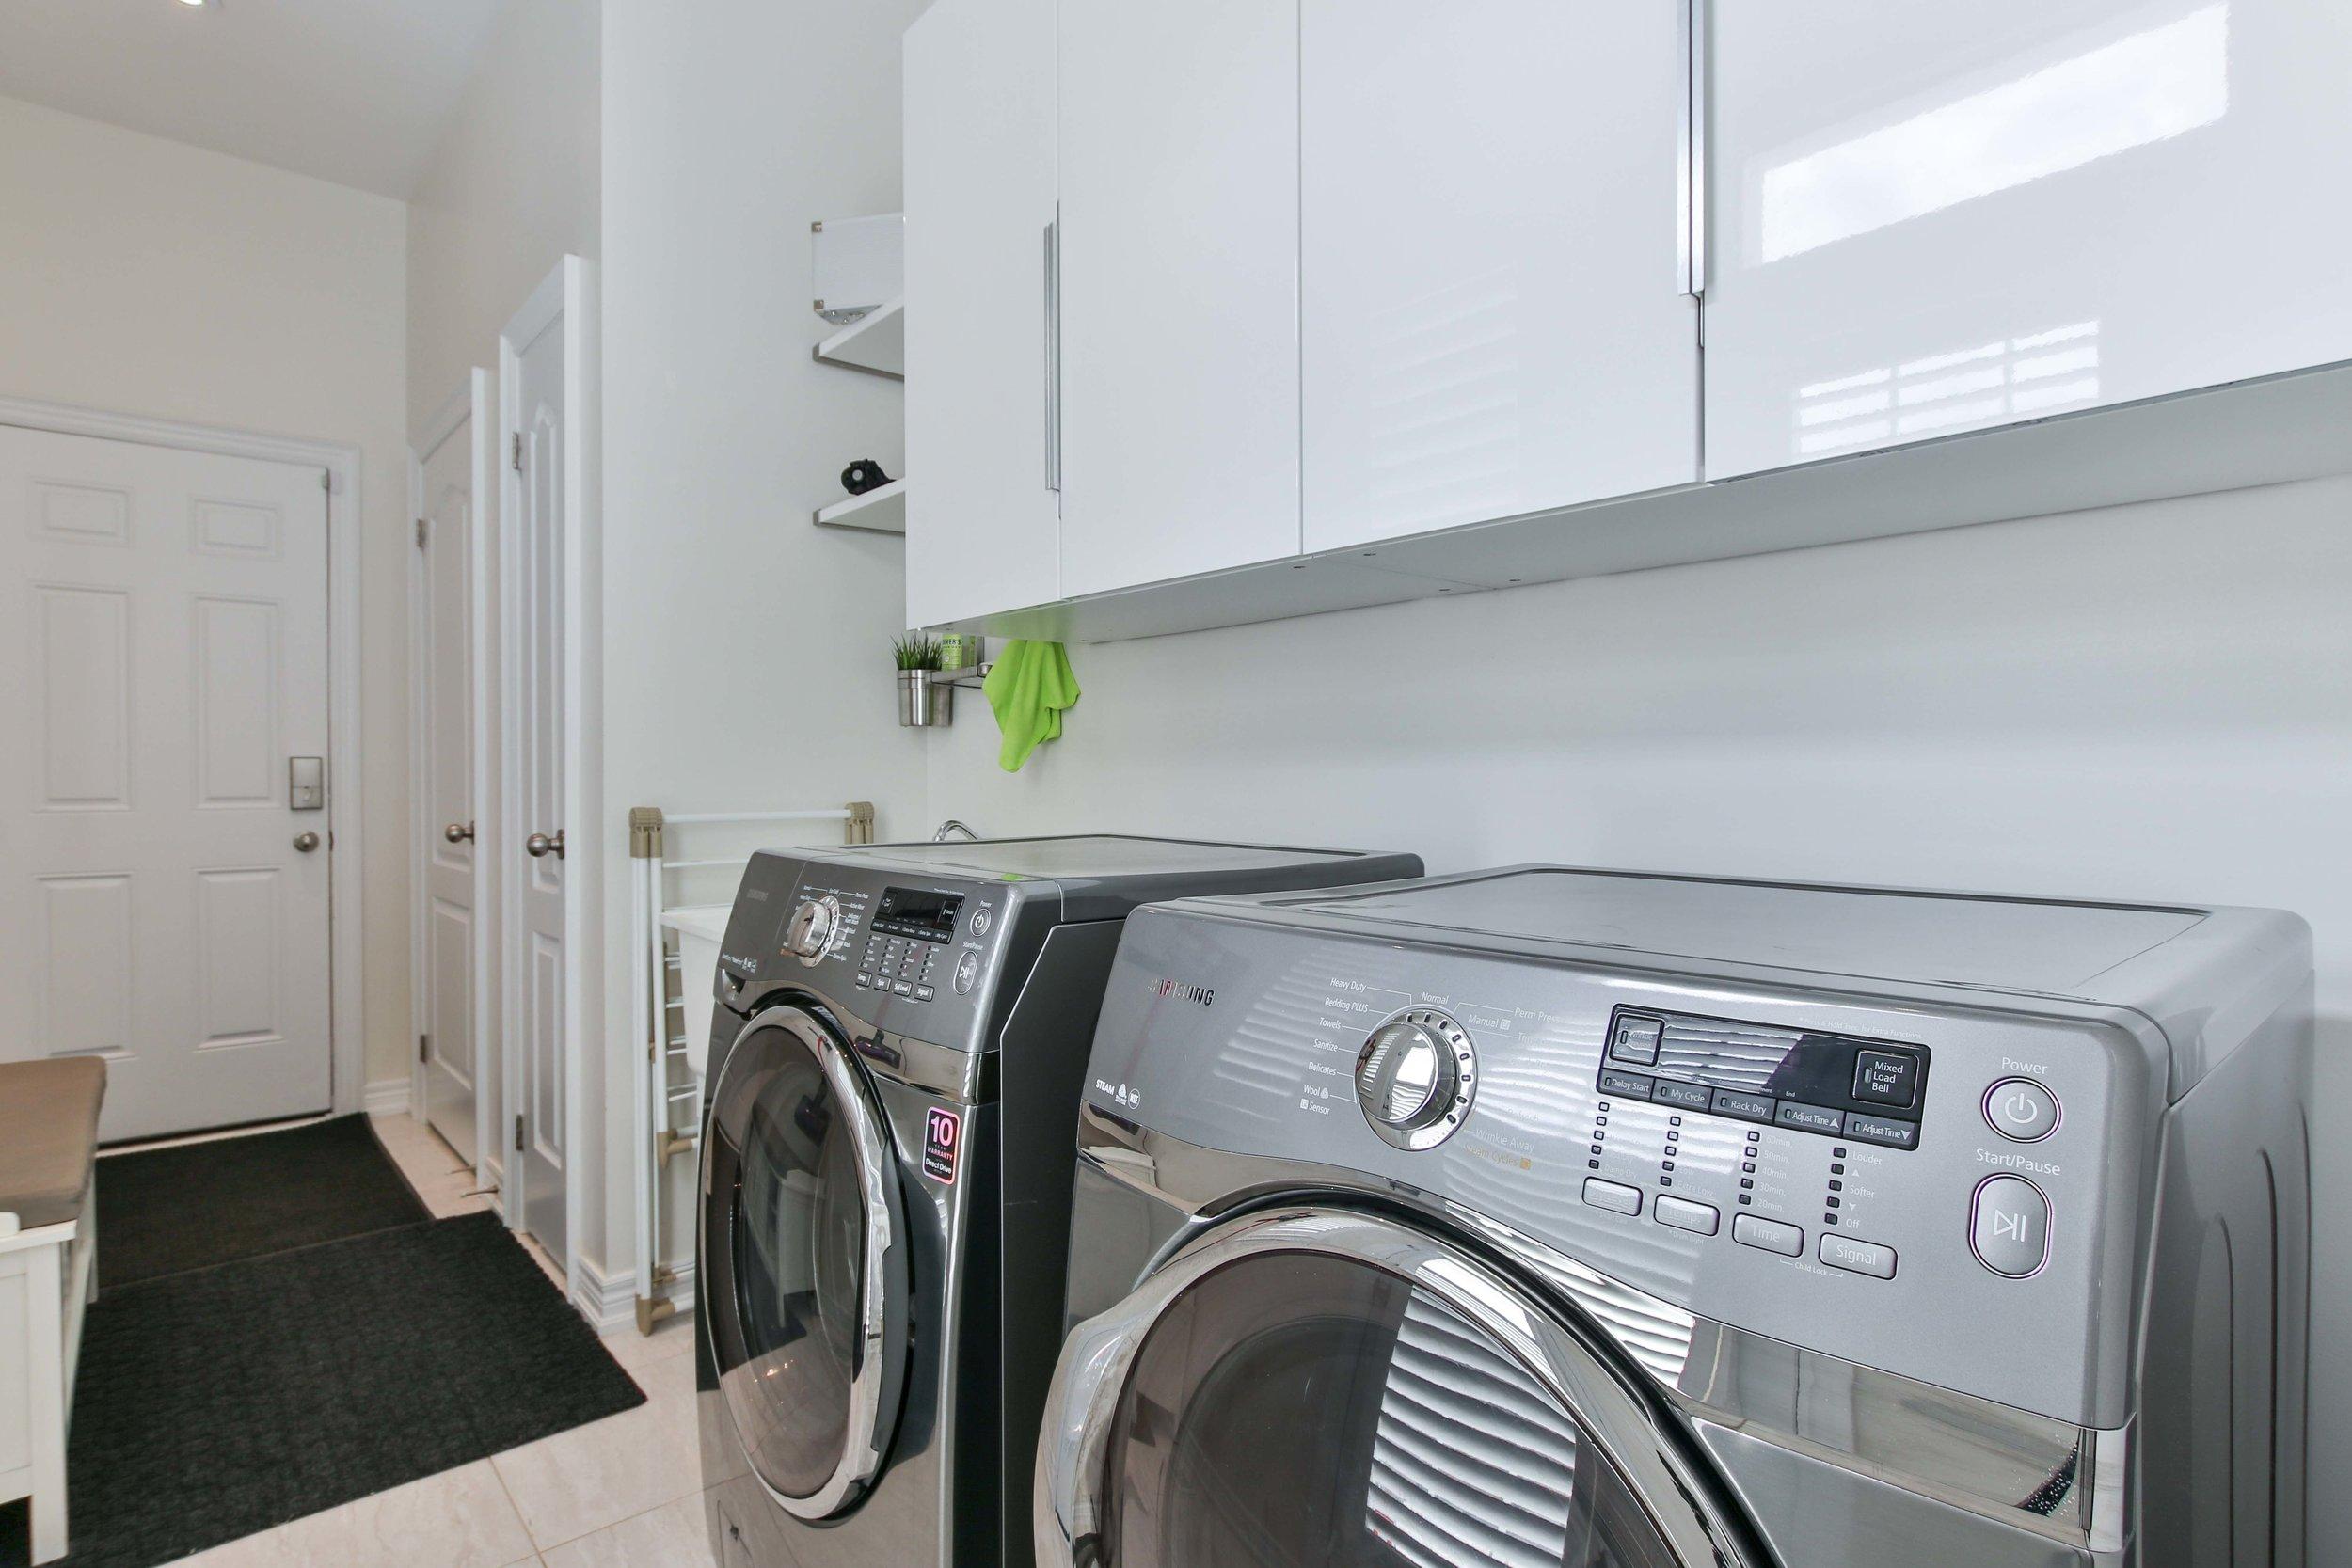 22_Laundry.jpg